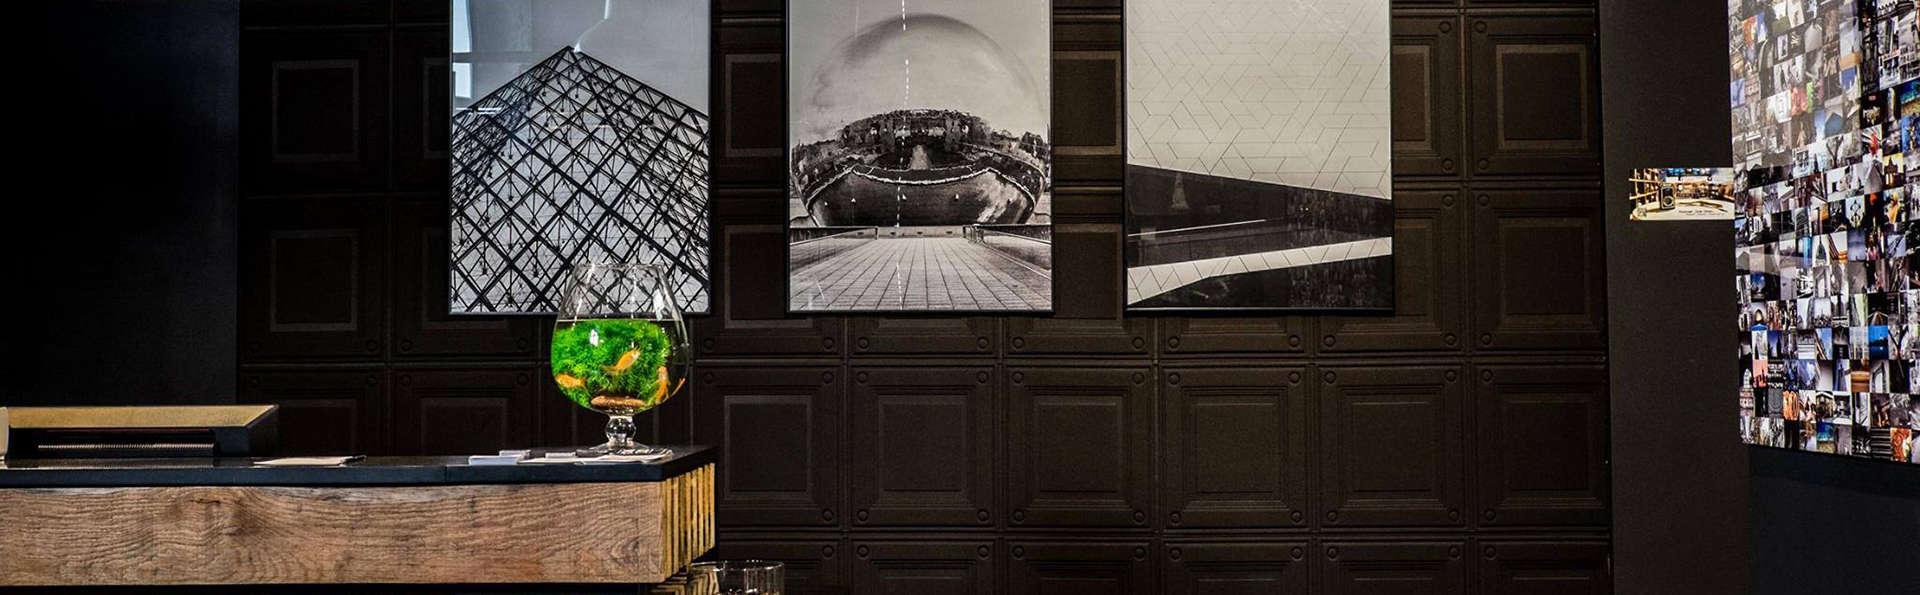 Citytrip in designhotel in Brussel